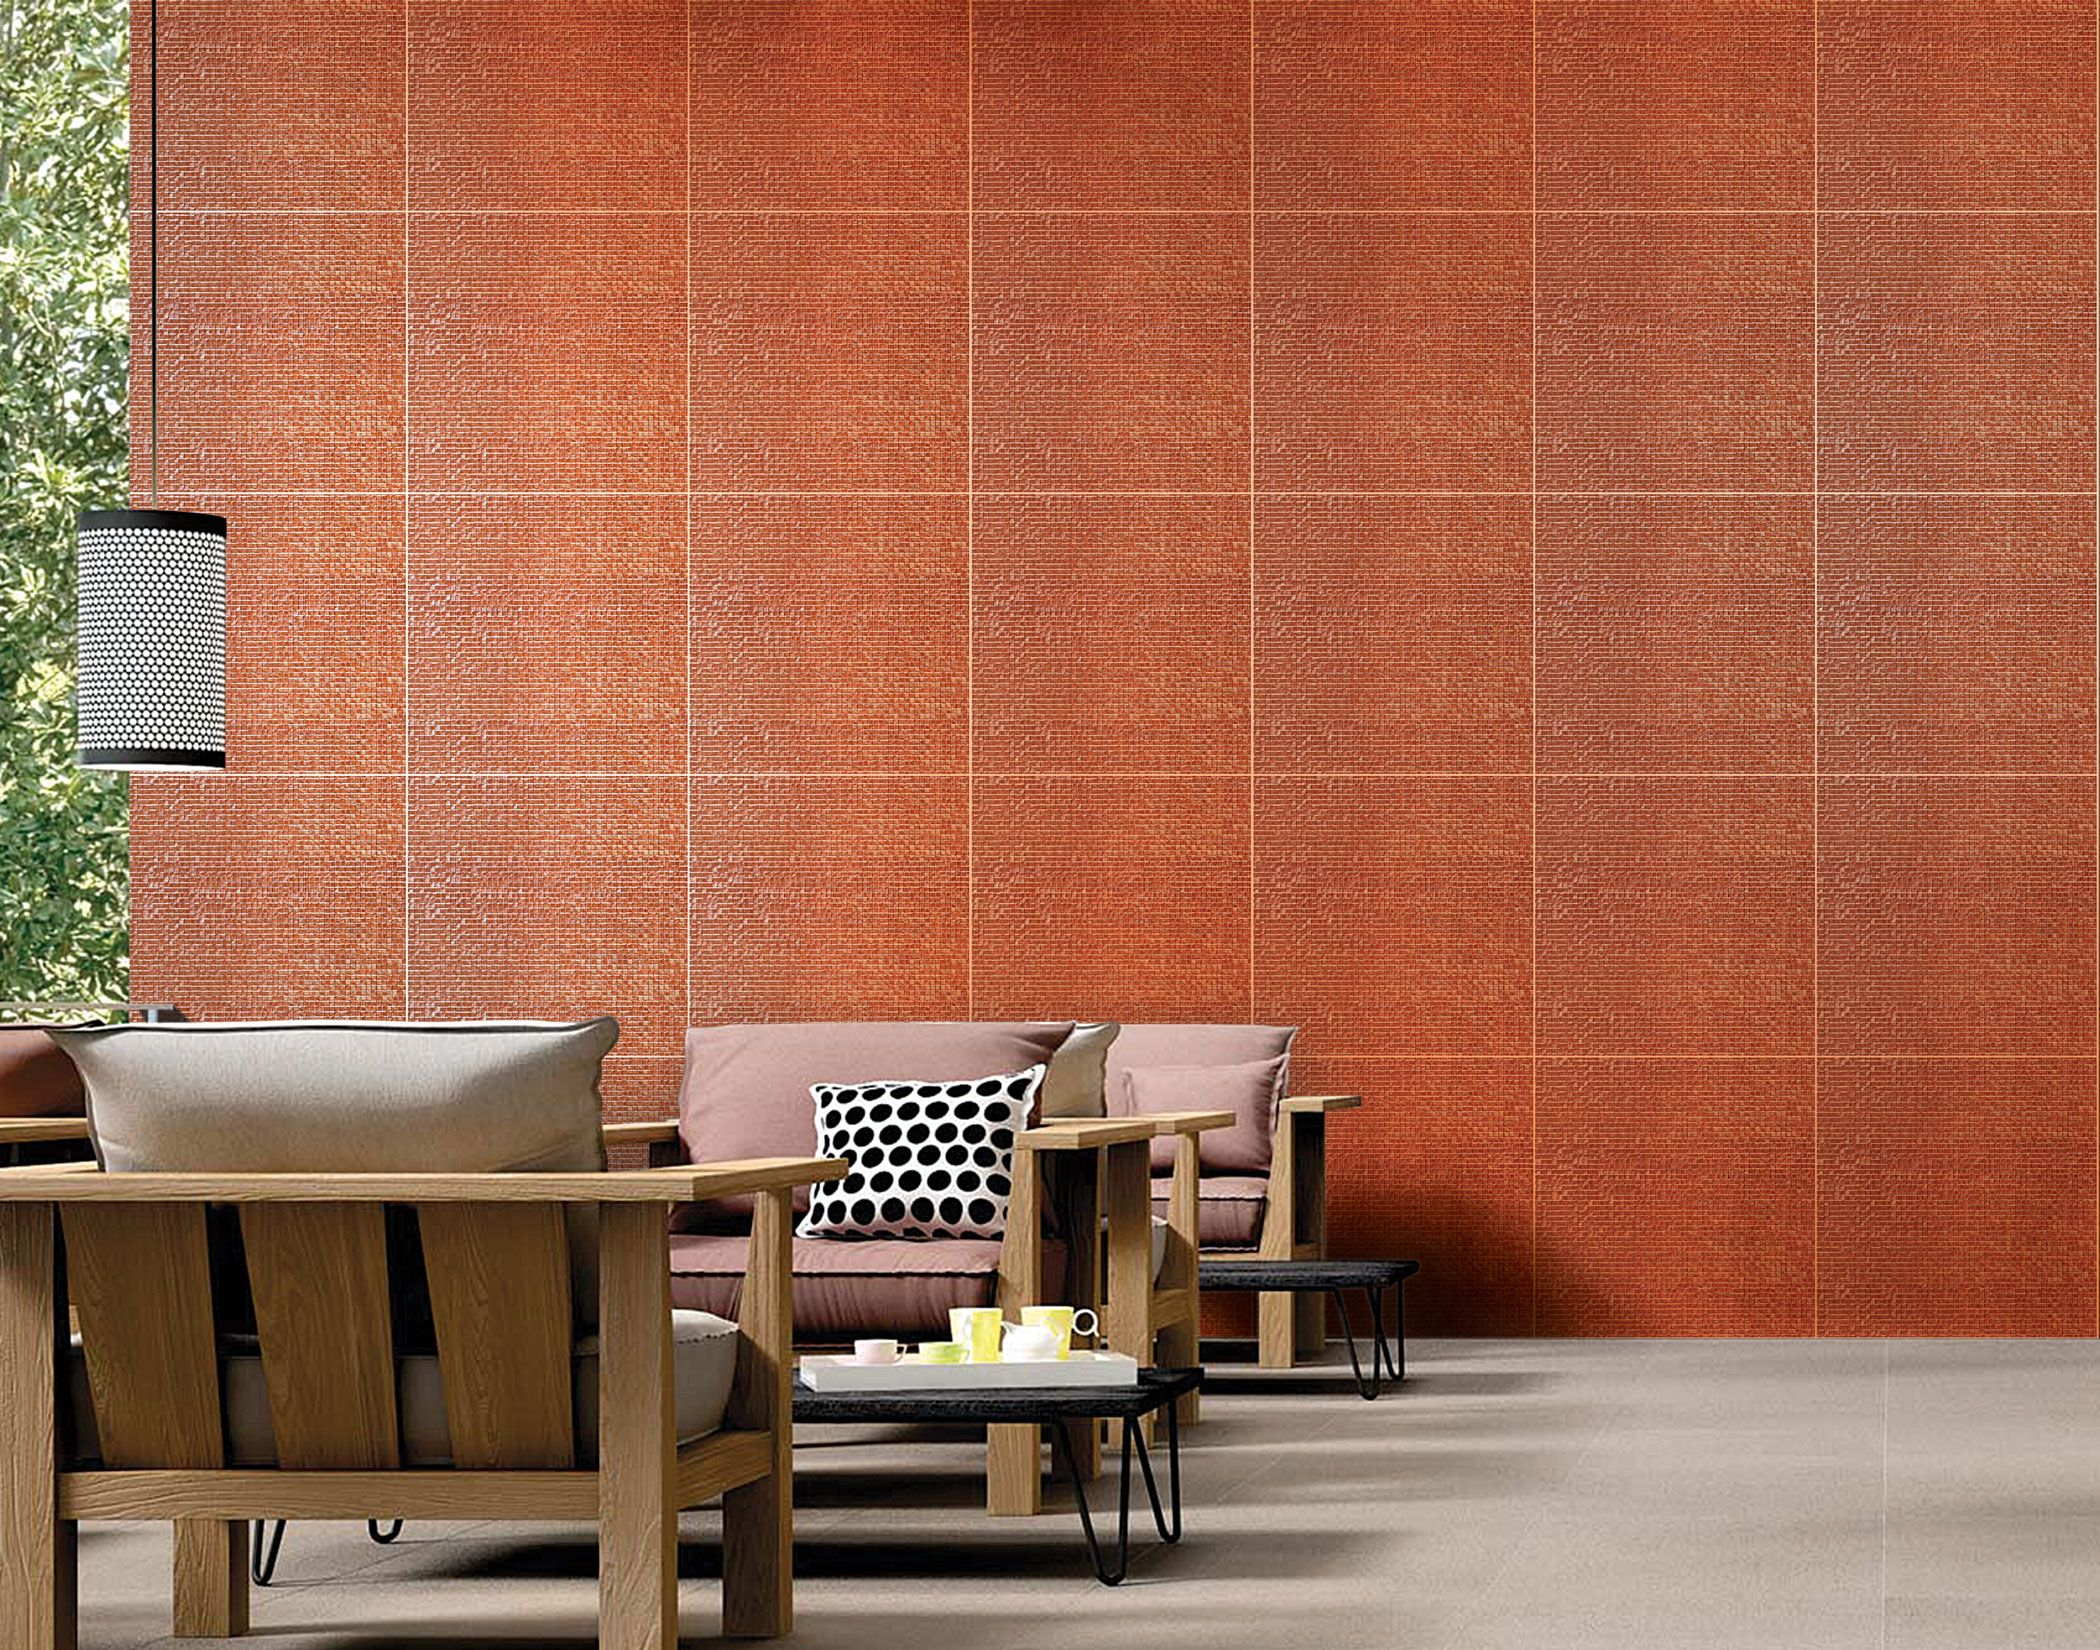 Ceramic Tile Living Room Wall Simple Home Decor Ideas Buy Designer Floor Tiles For Bathroom Bedroom Kitchen Office Outdoor Vitrified Exterior Online India